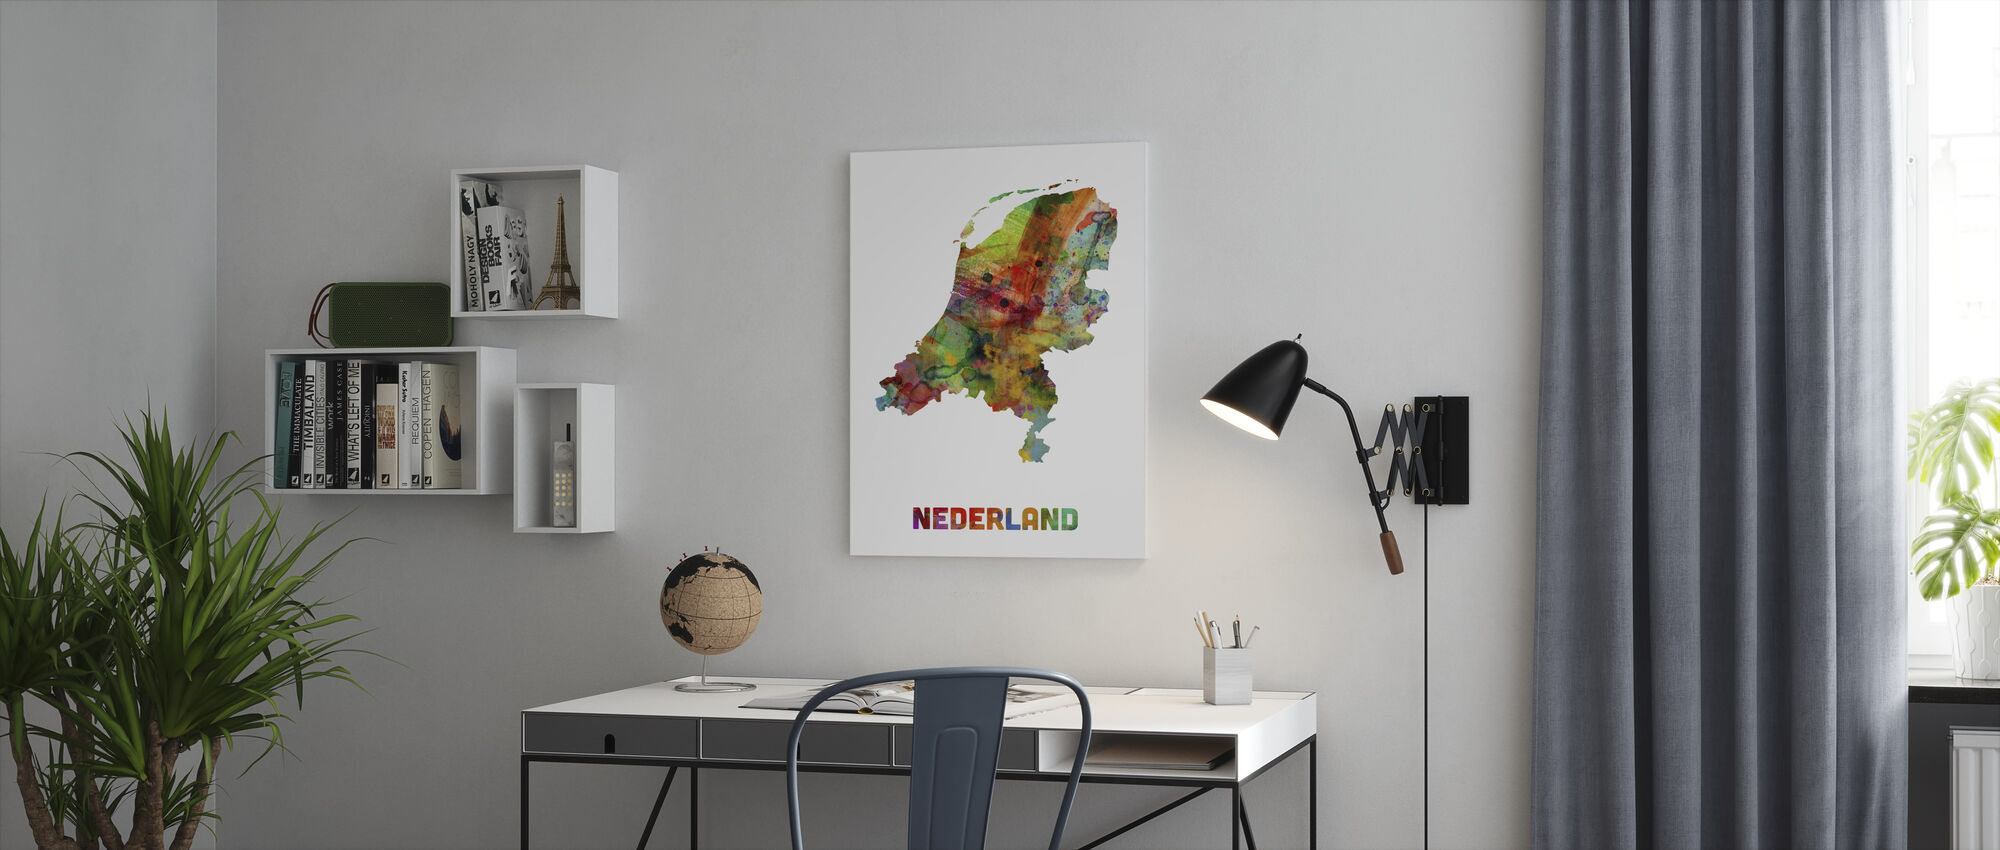 Nederland Watercolor Kaart - Canvas print - Kantoor